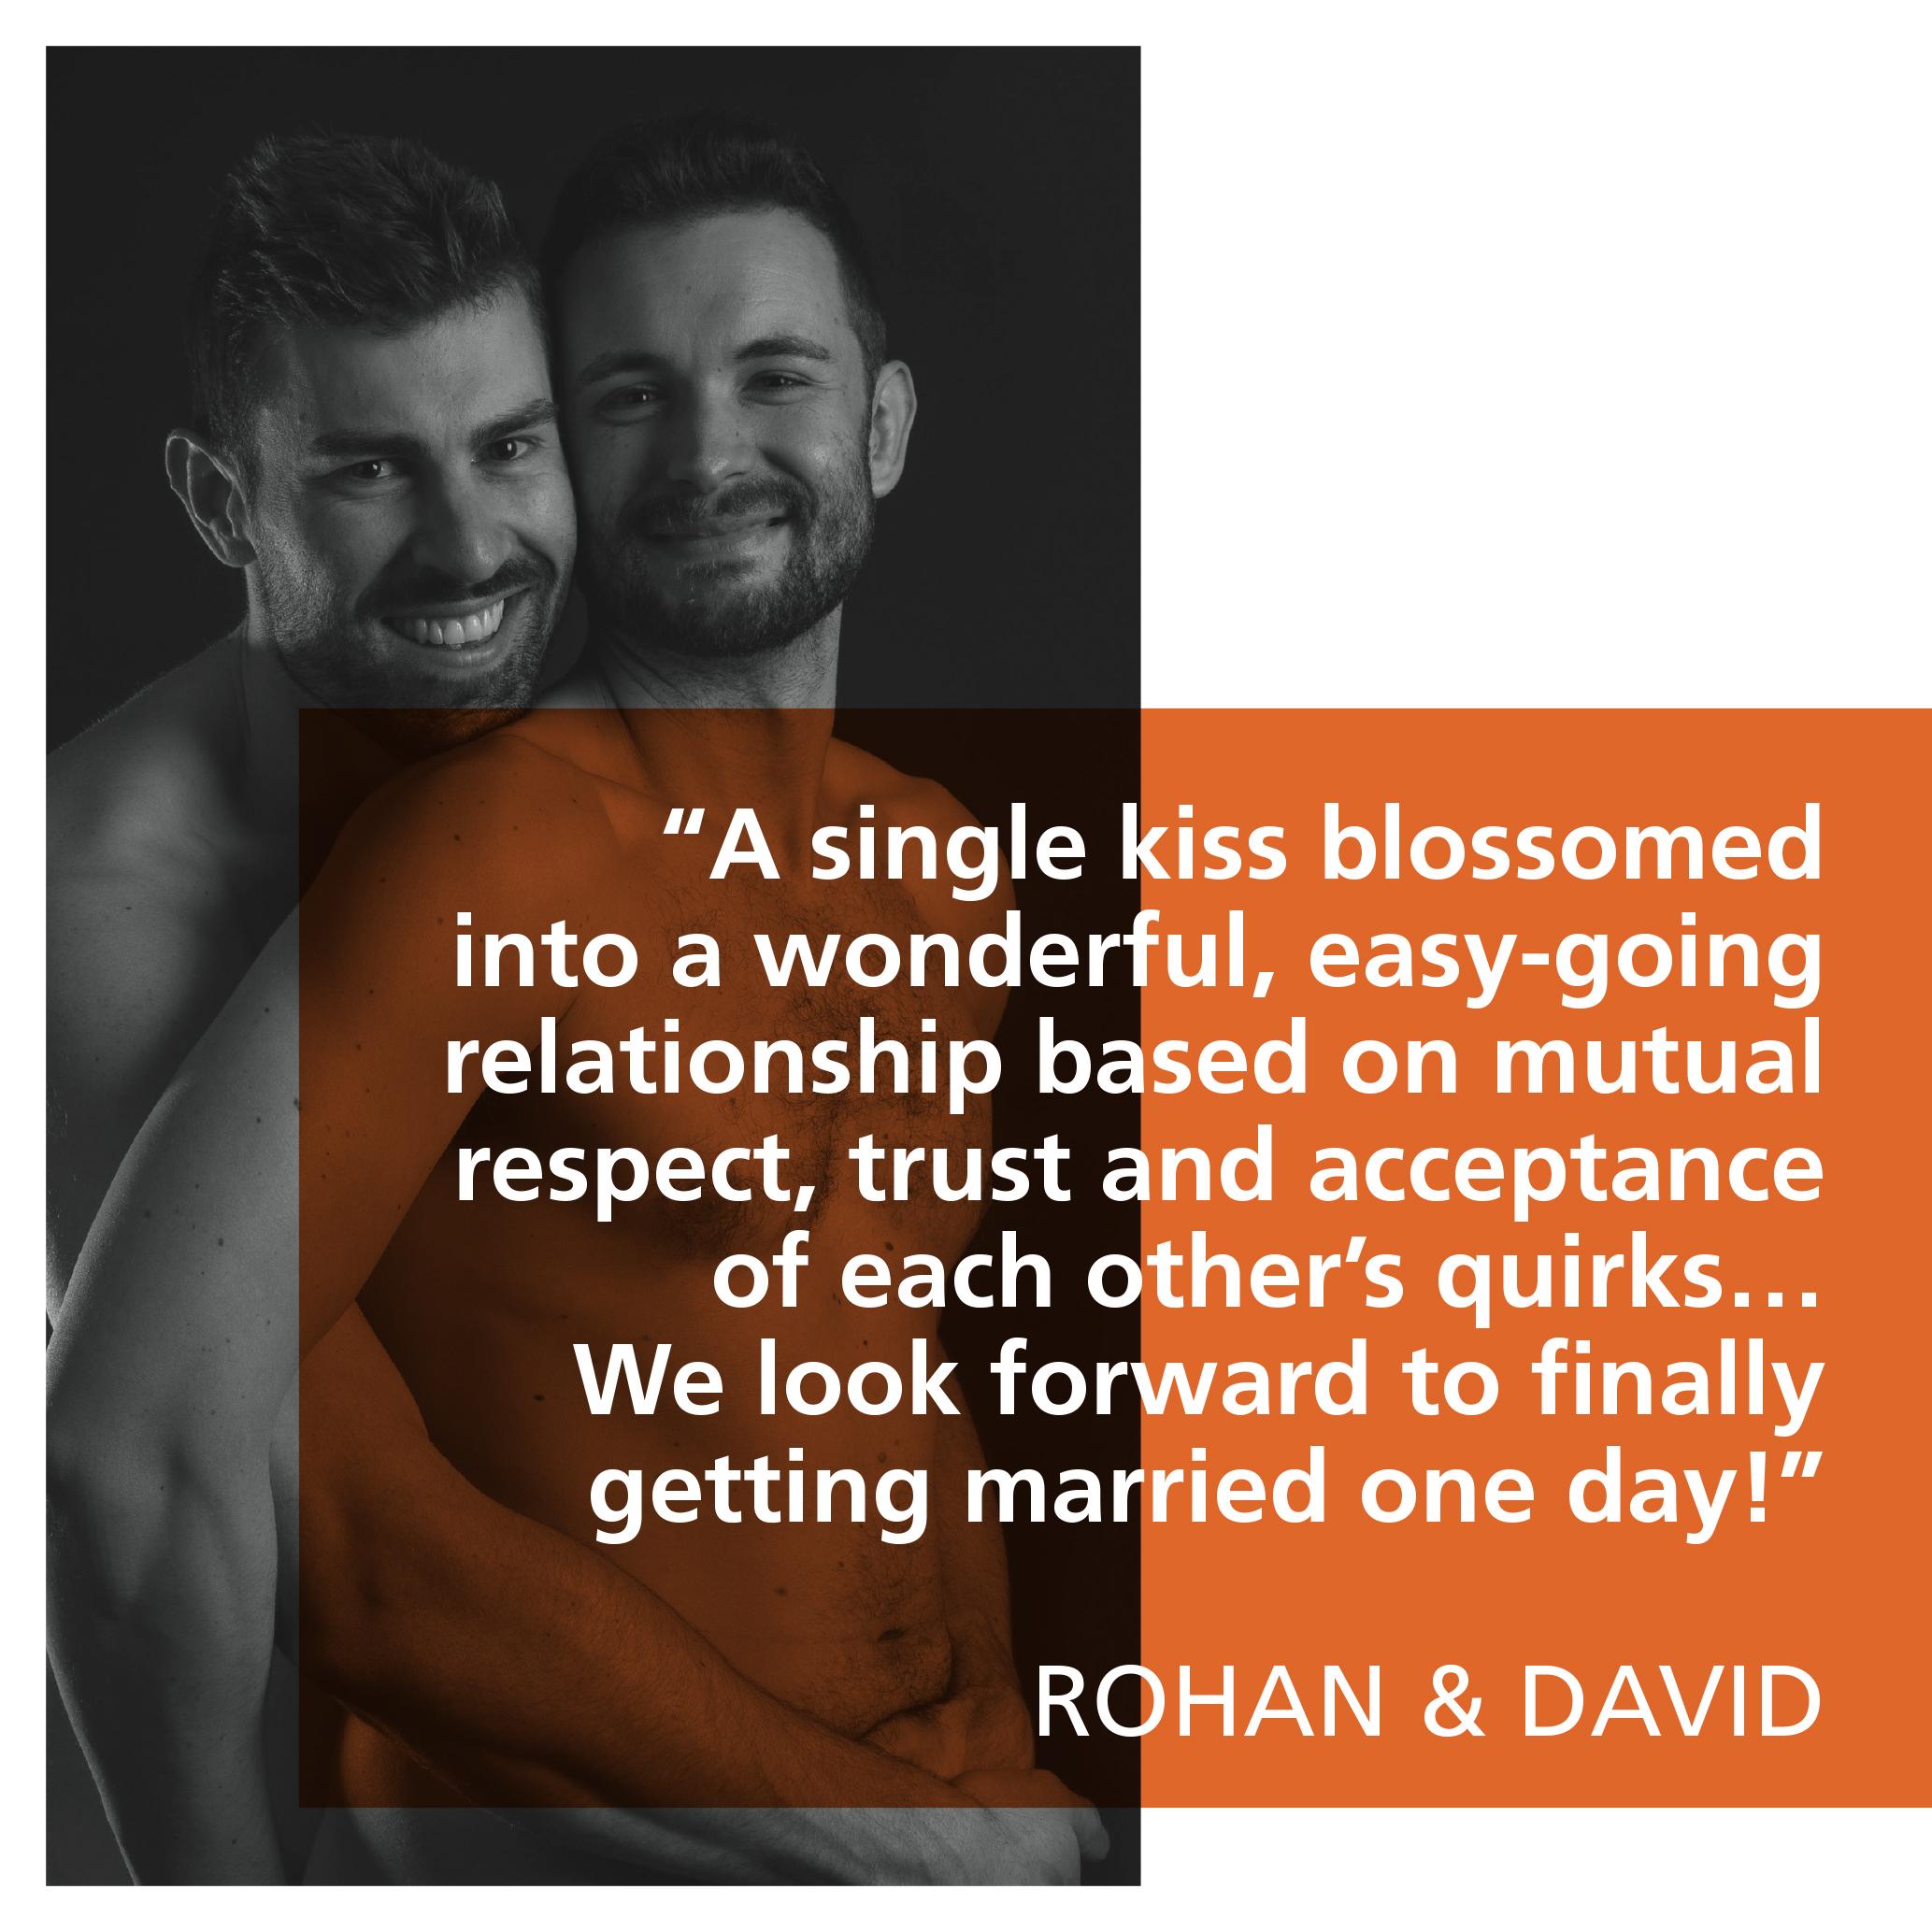 1612_FACEBOOK ROHAN & DAVID.jpg